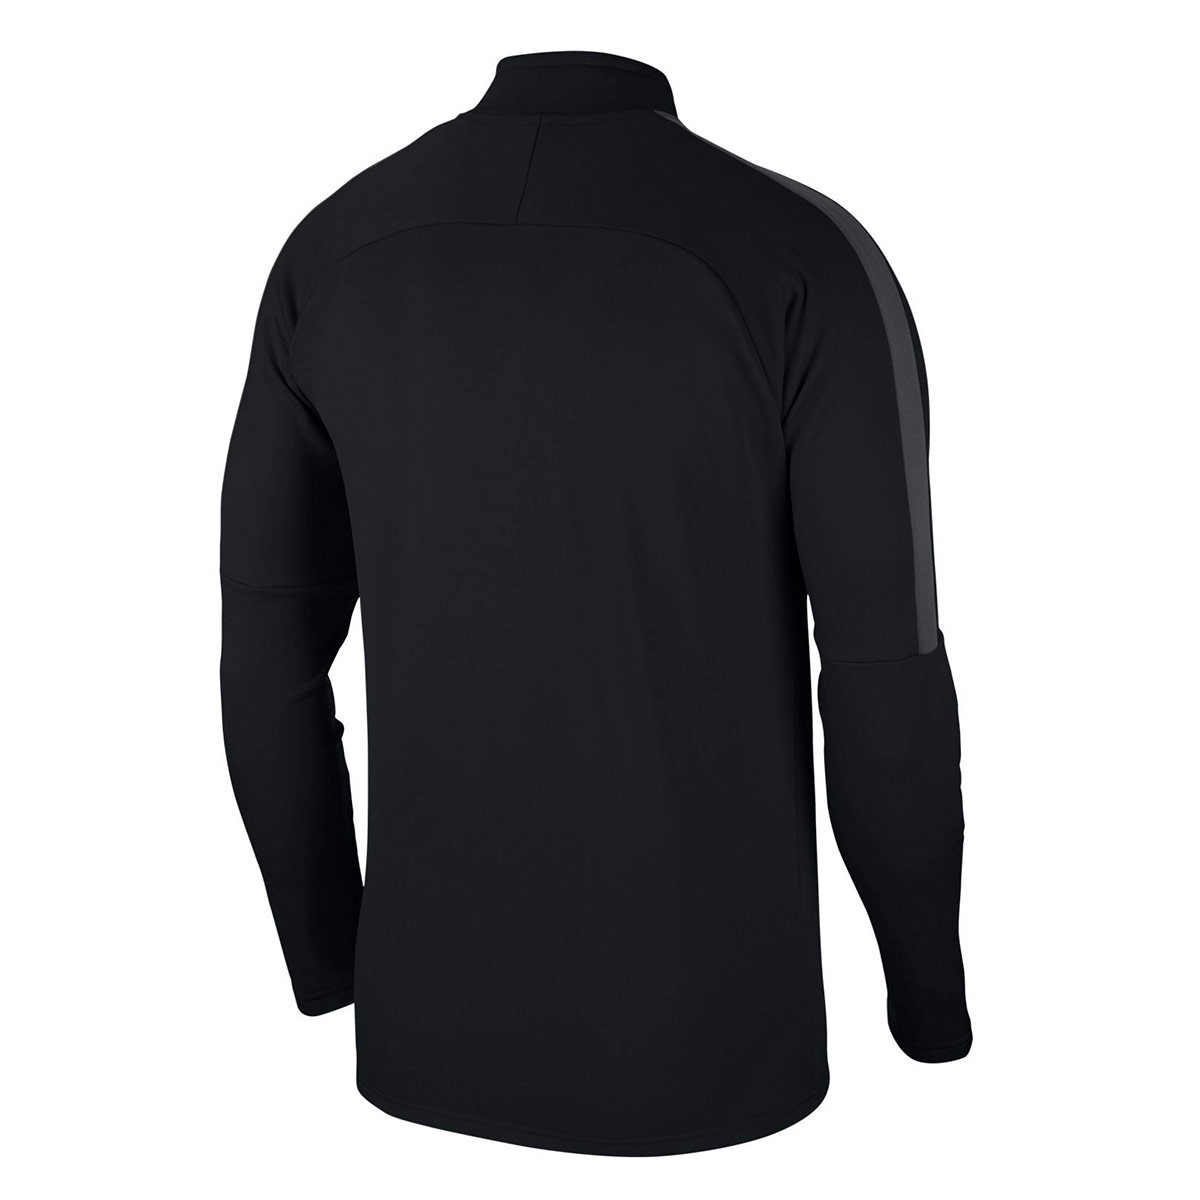 003d45de119 Sweatshirt Nike Kids Academy 18 Drill Black-Anthracite-White - Football  store Fútbol Emotion